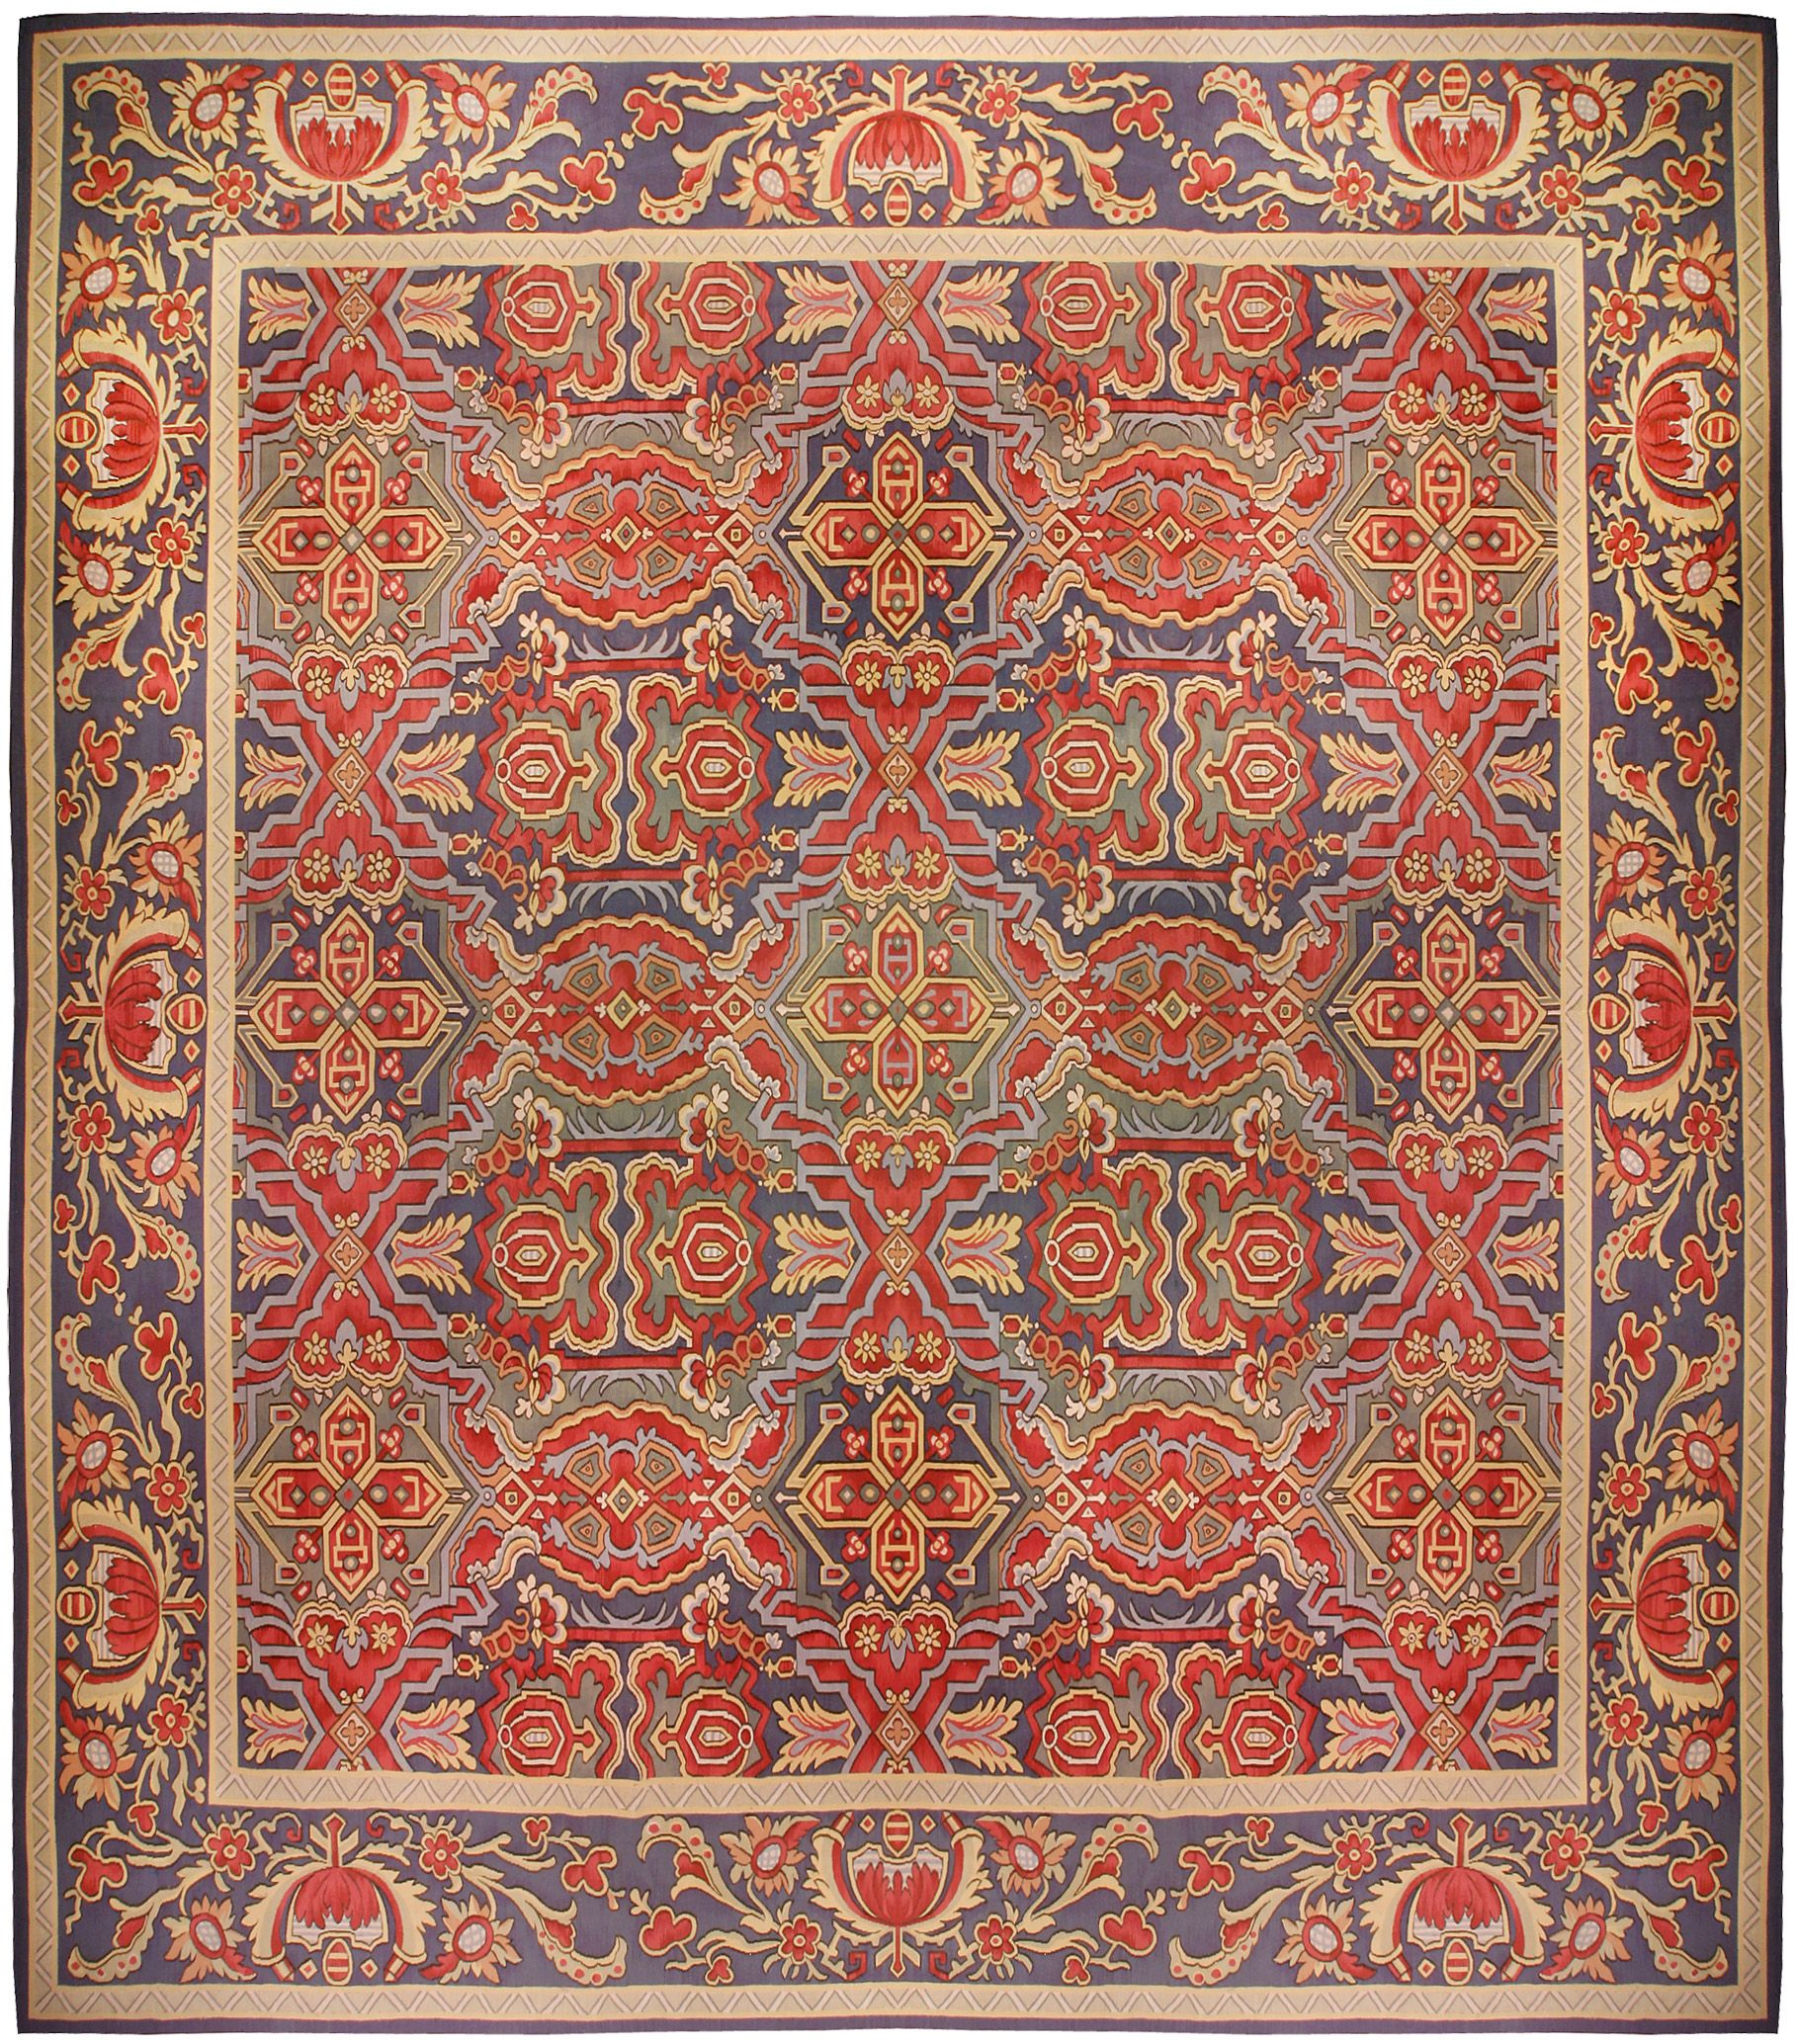 Large Aubusson Rug: Oversized Antique French Aubusson Carpet